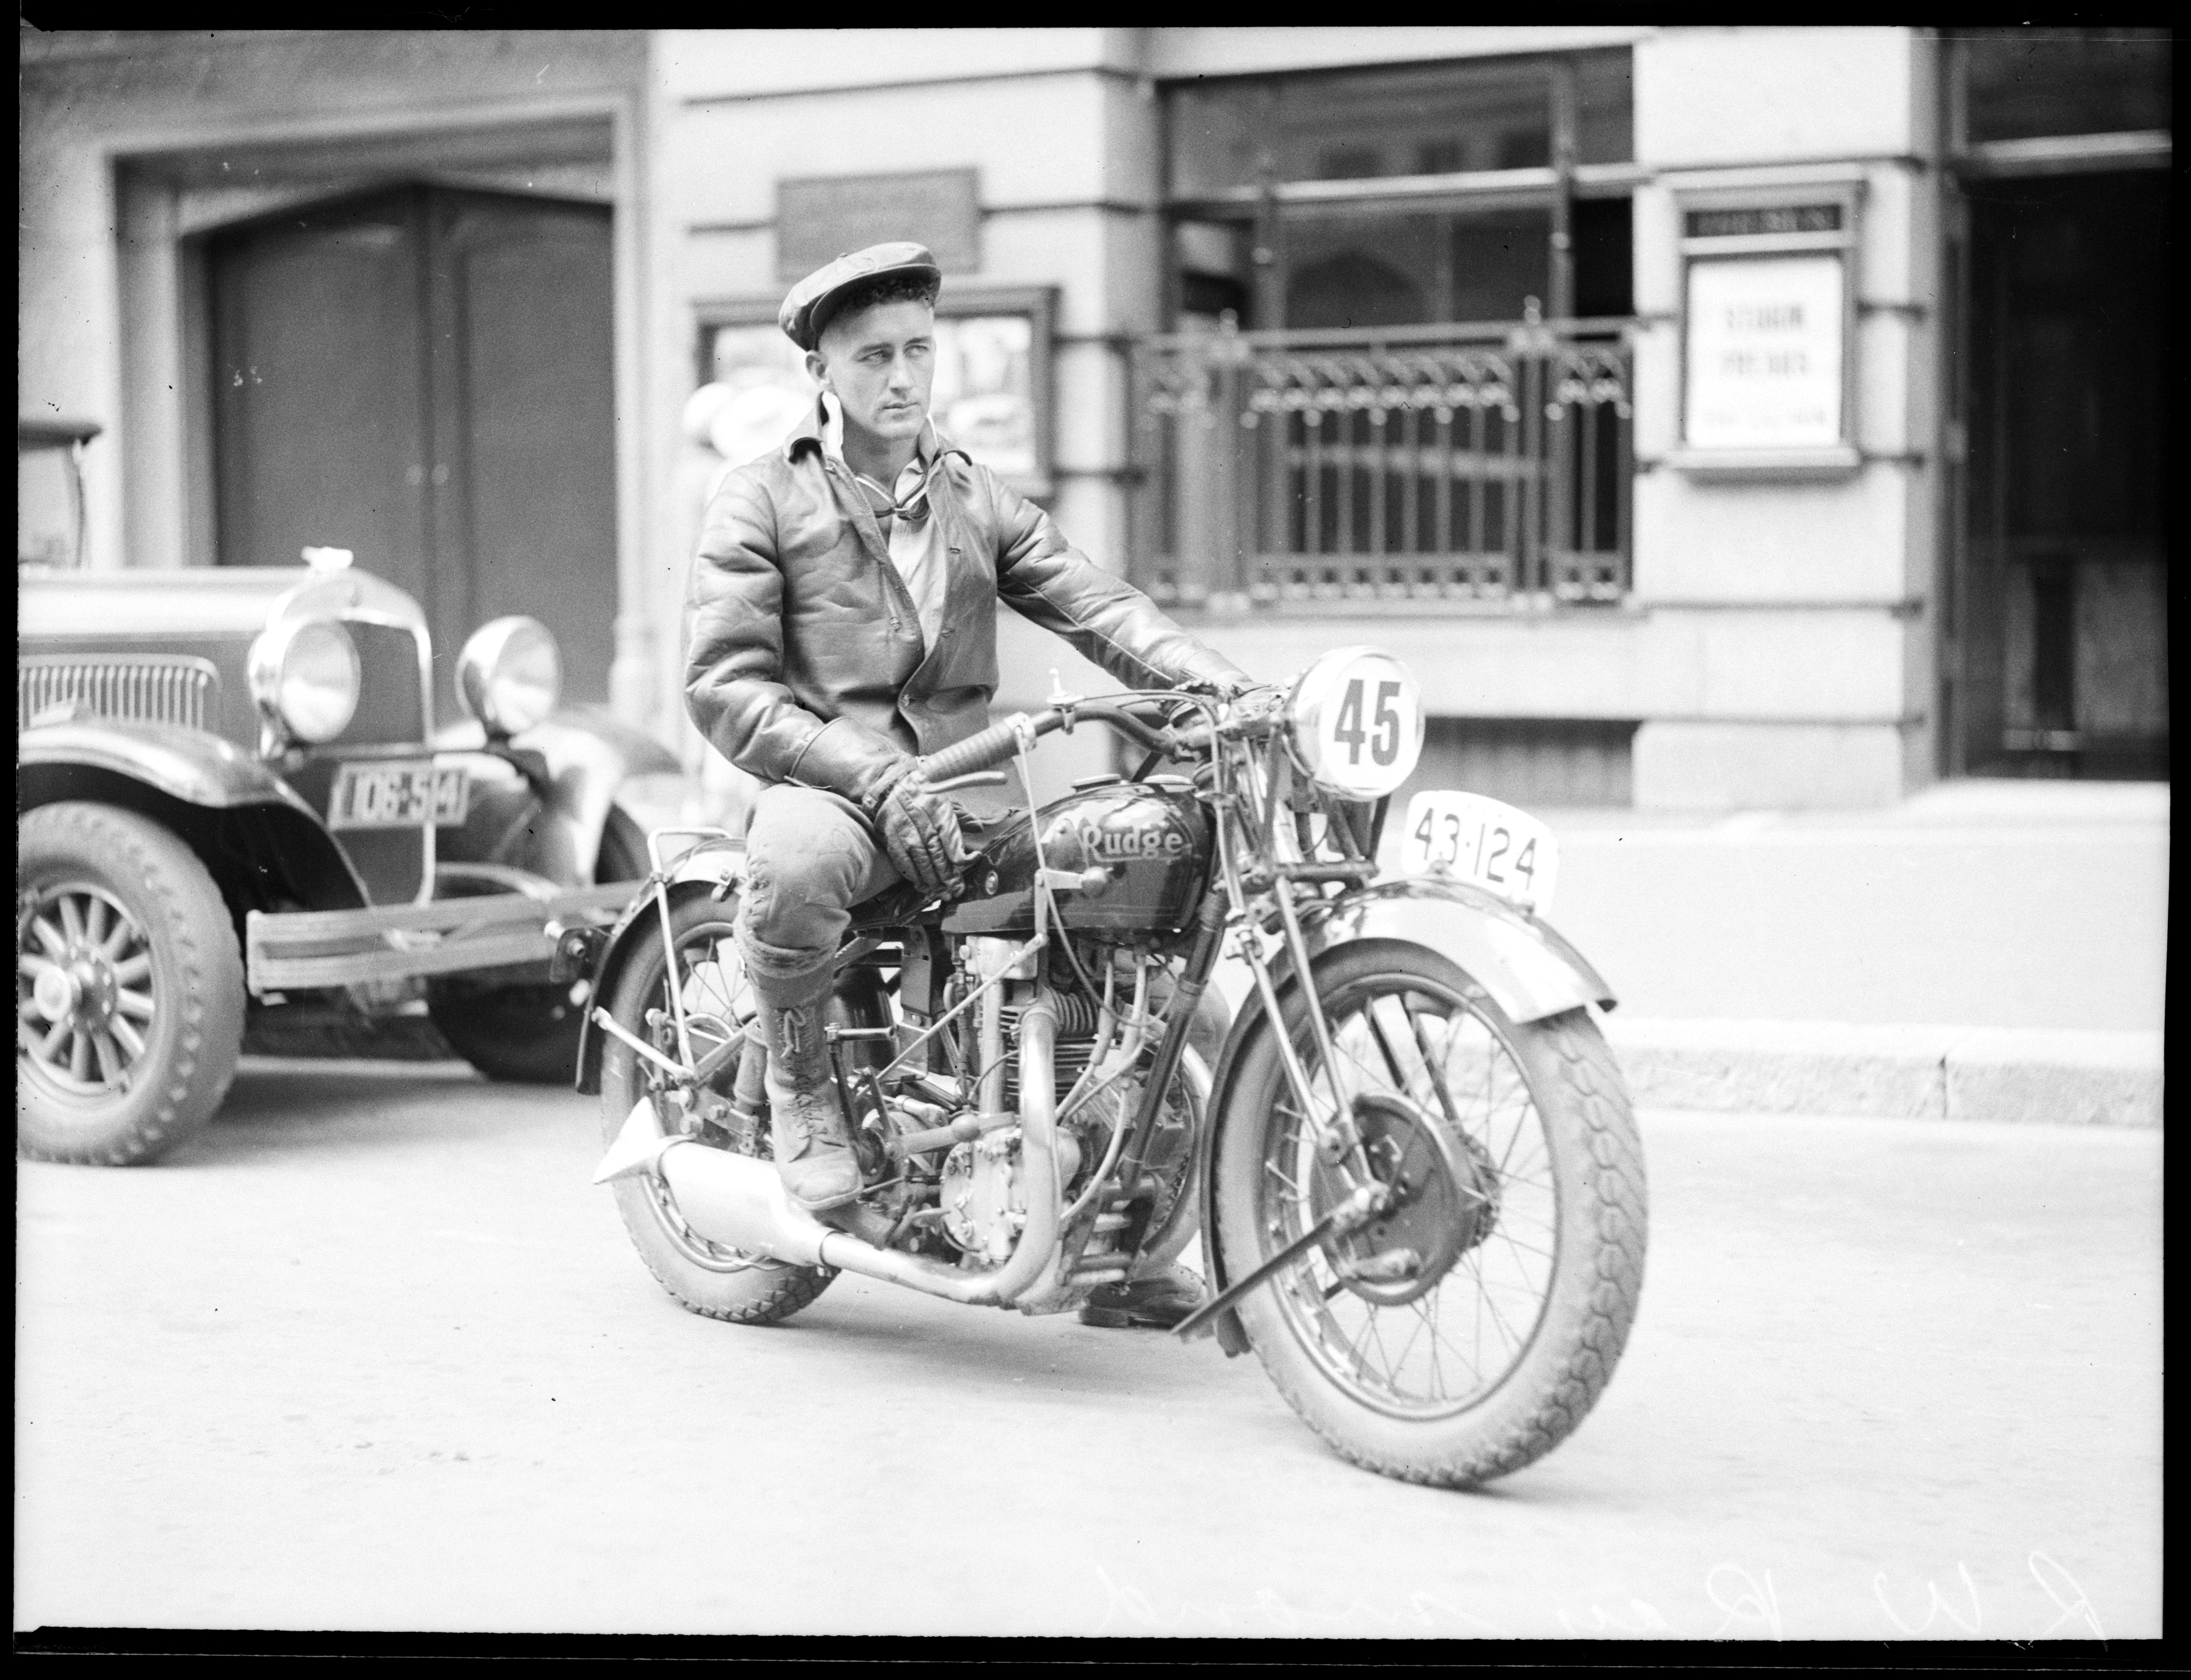 Male Motorcycle rider on his Rudge racing bike, ca. 1935